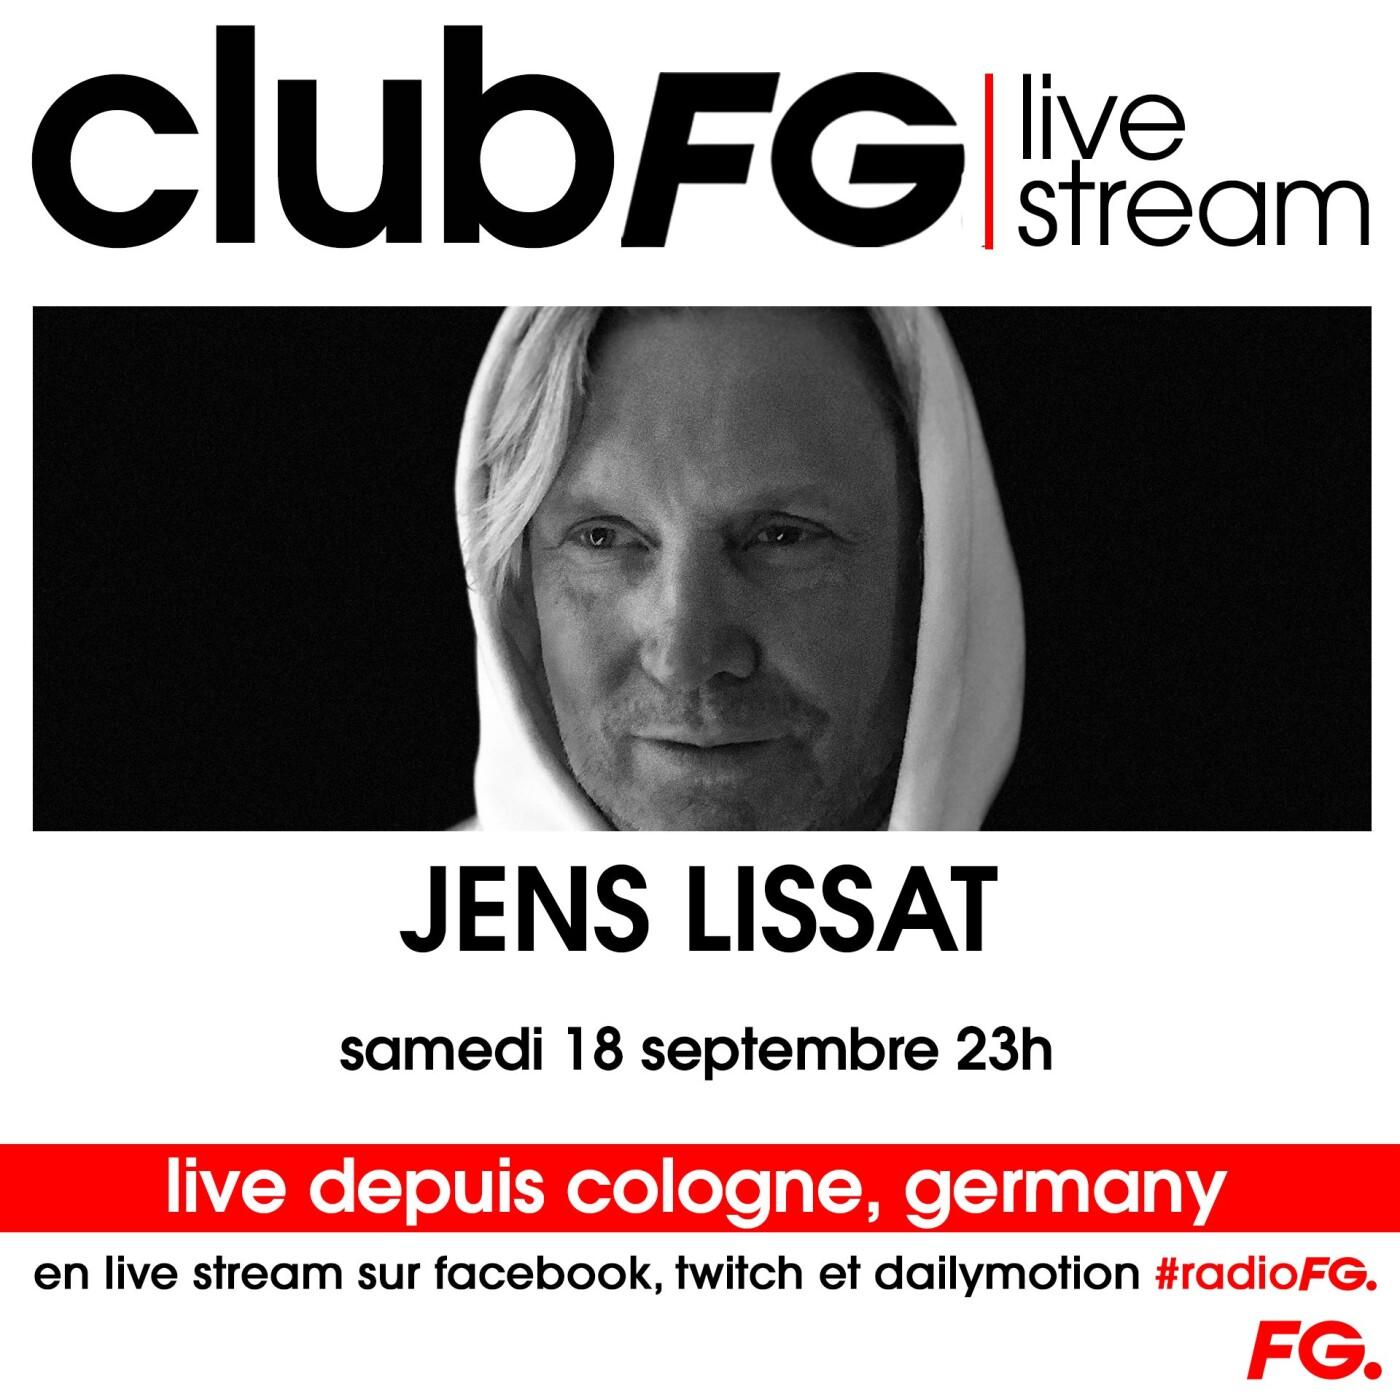 CLUB FG LIVE STREAM : JENS LISSAT